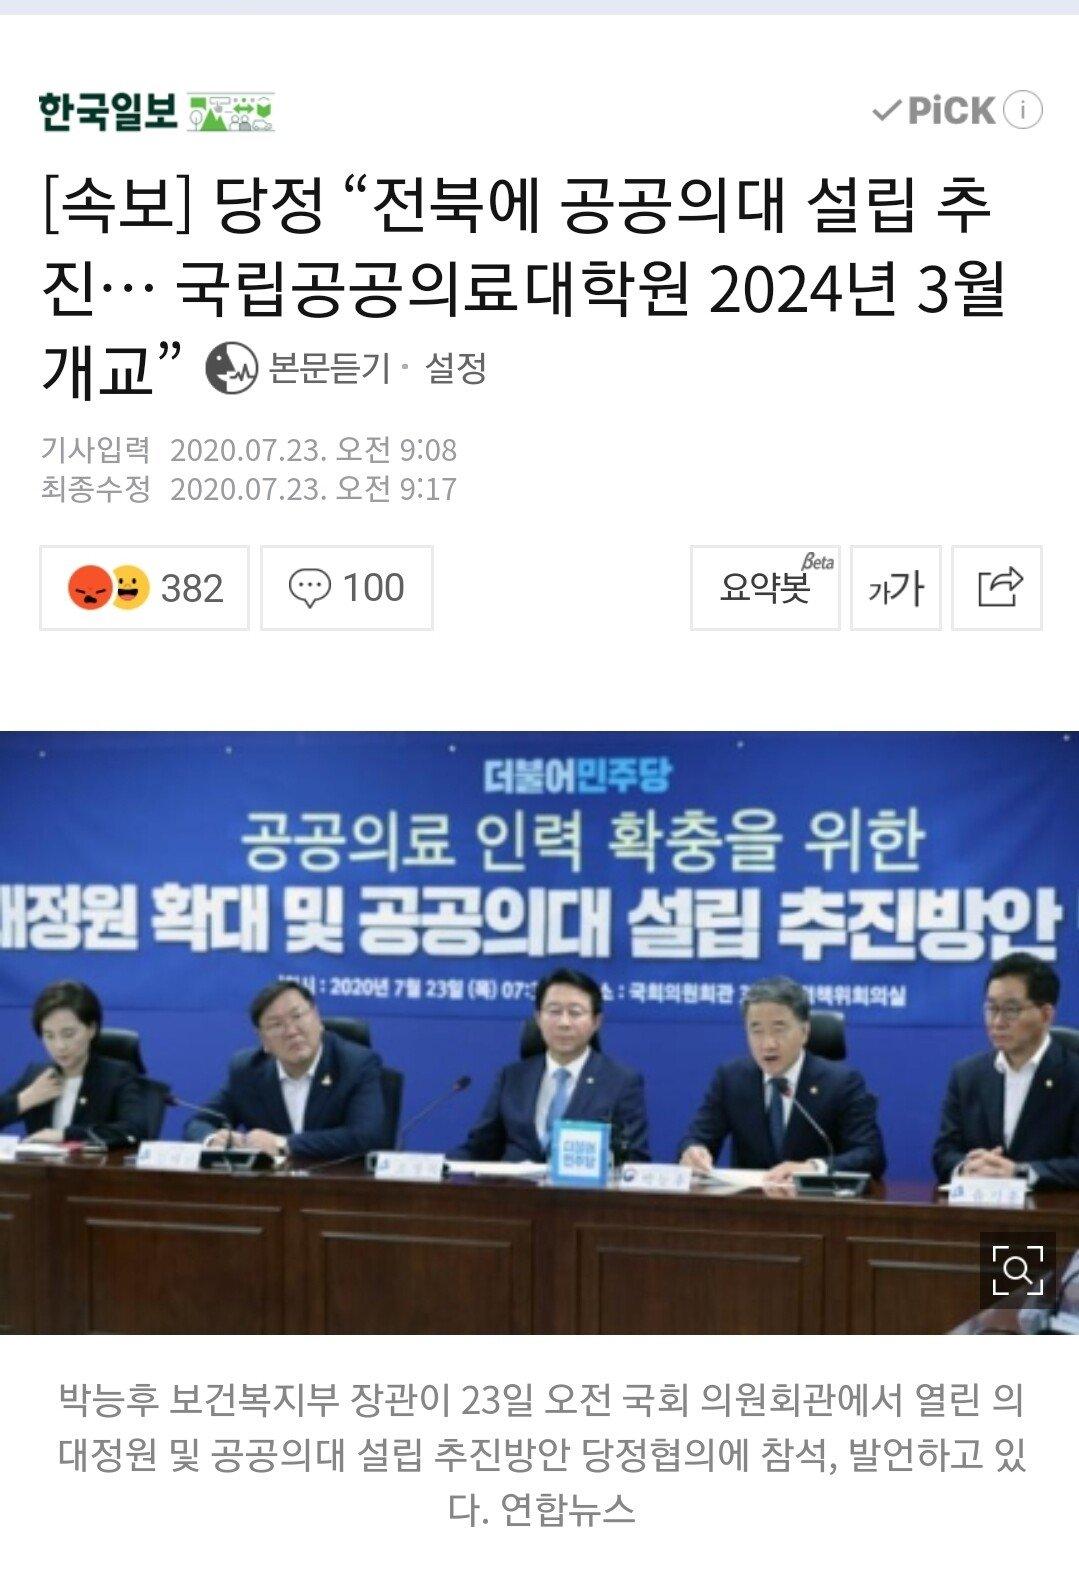 Screenshot_20200723-092805_Samsung Internet.jpg 전북에 공공의대 설립 추진